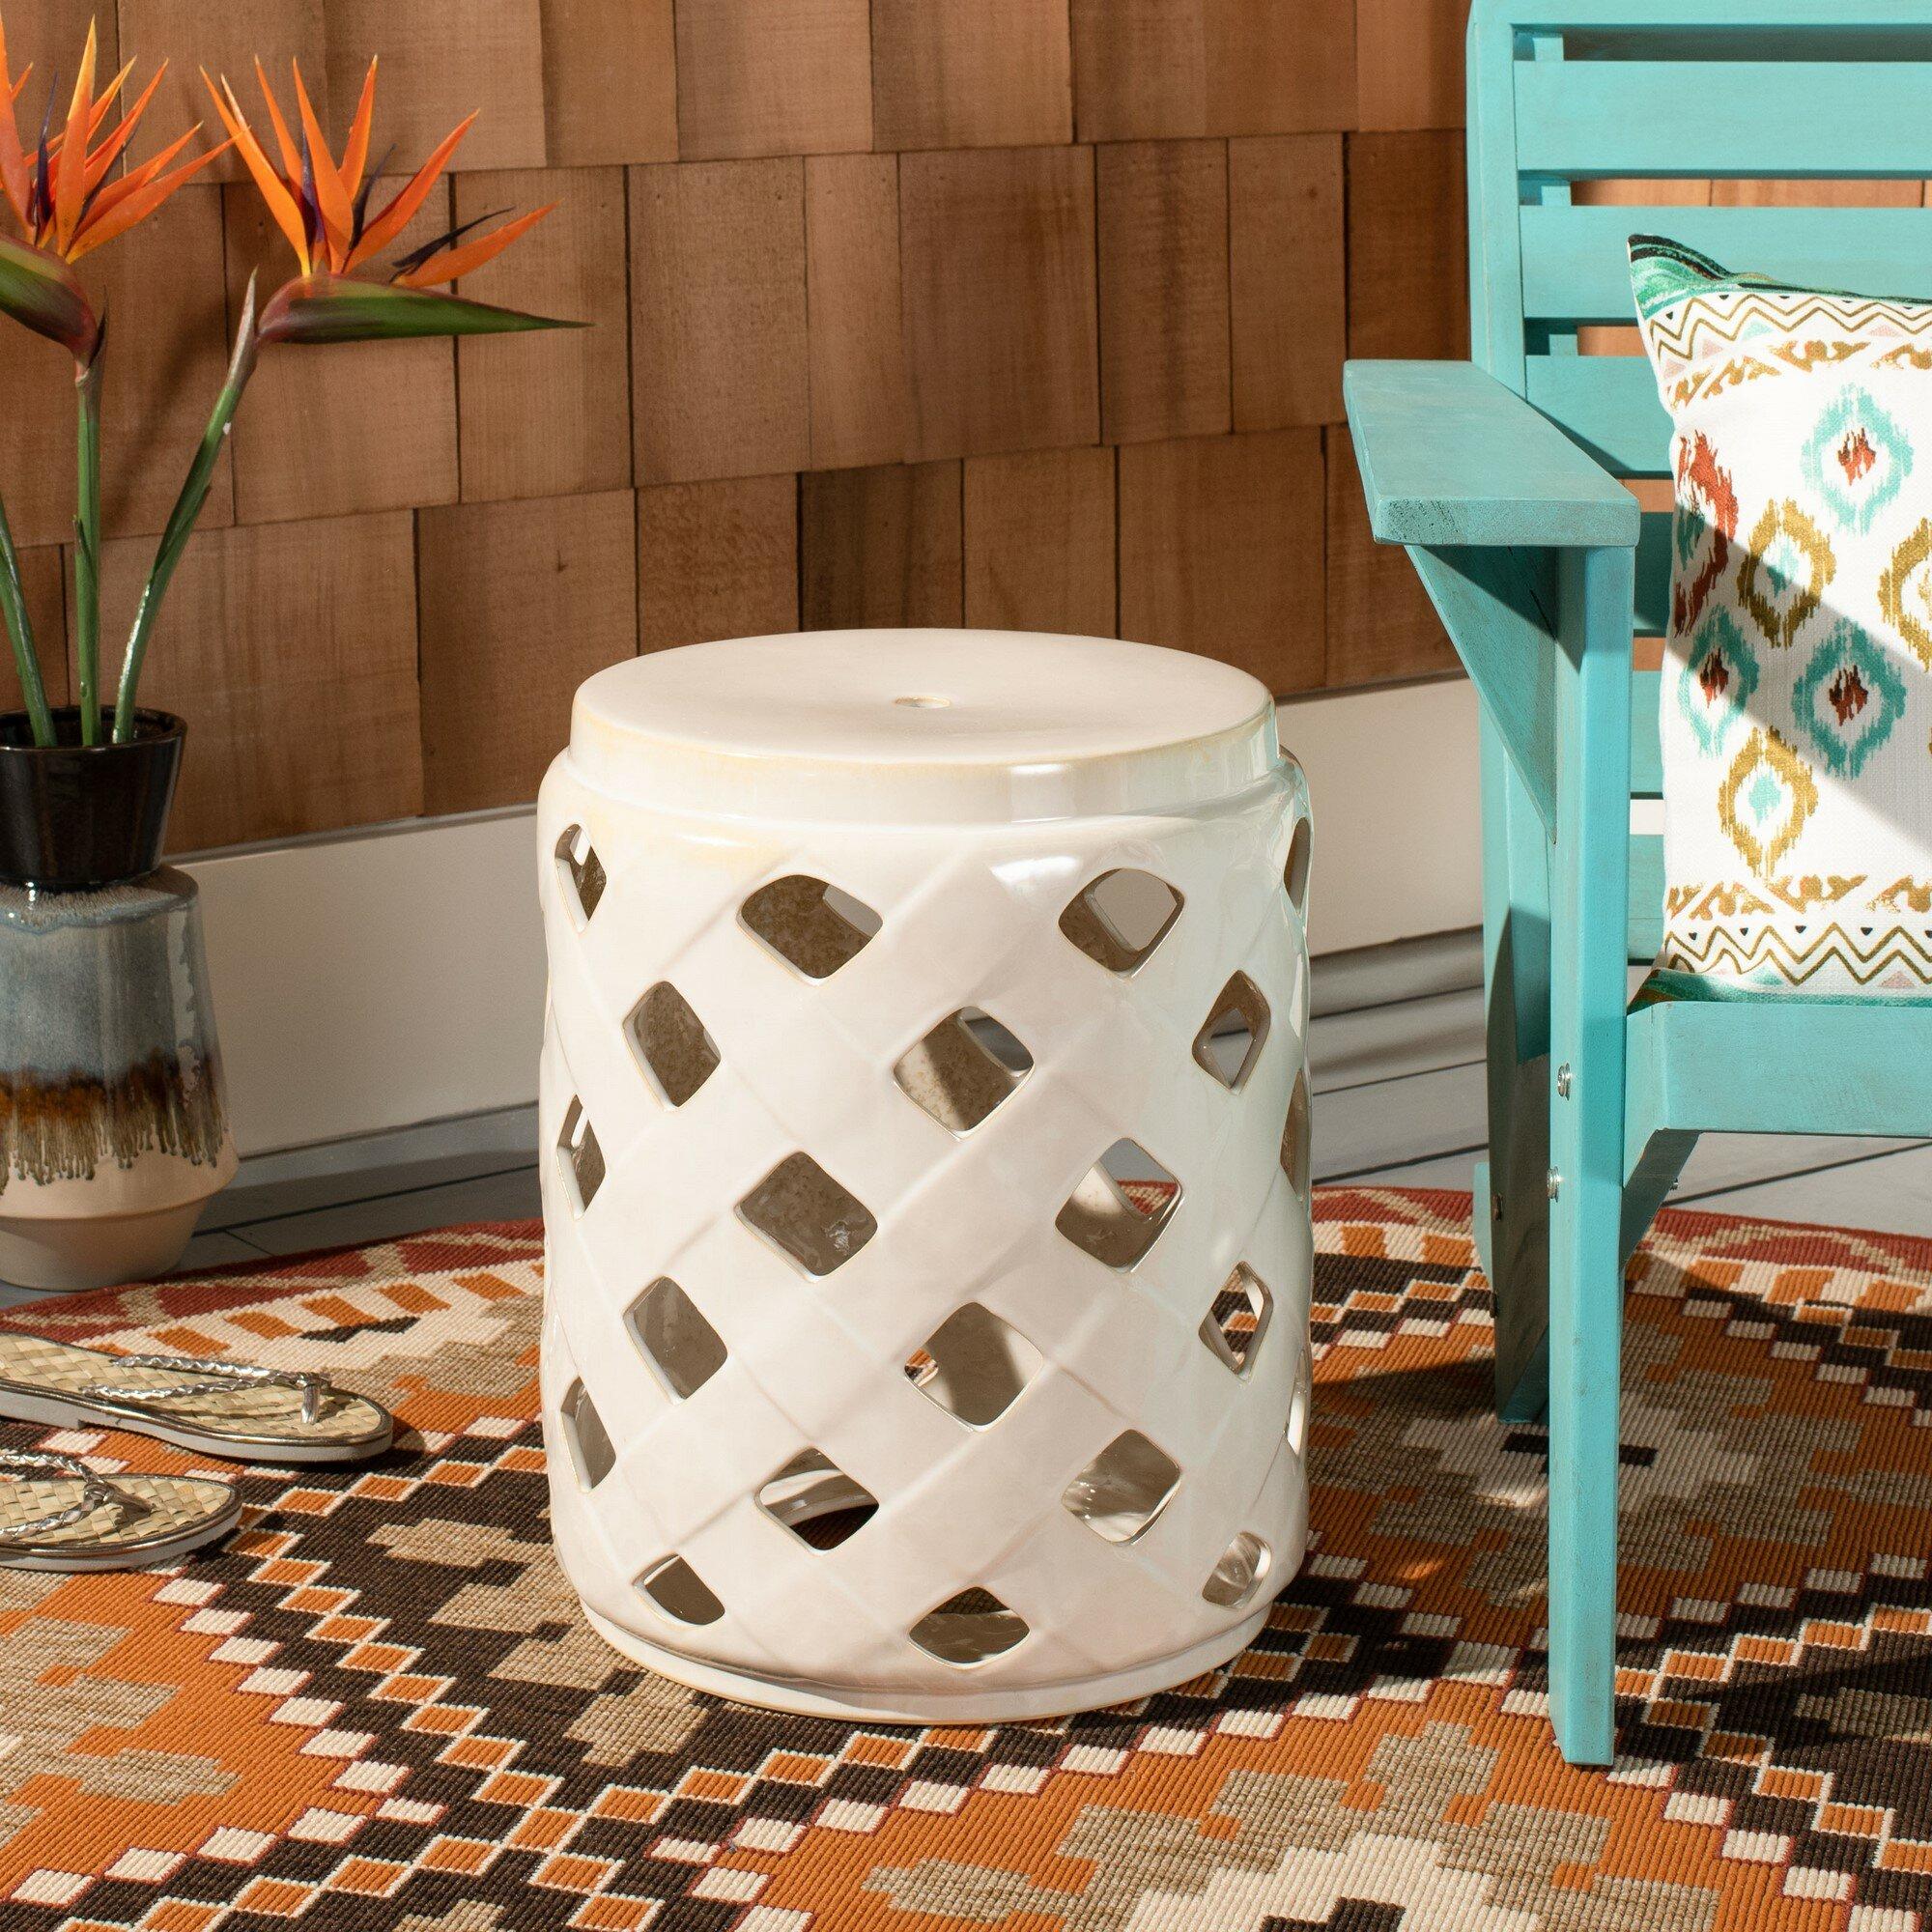 Caron Ceramic Garden Stool With Winterview Garden Stools (View 20 of 25)